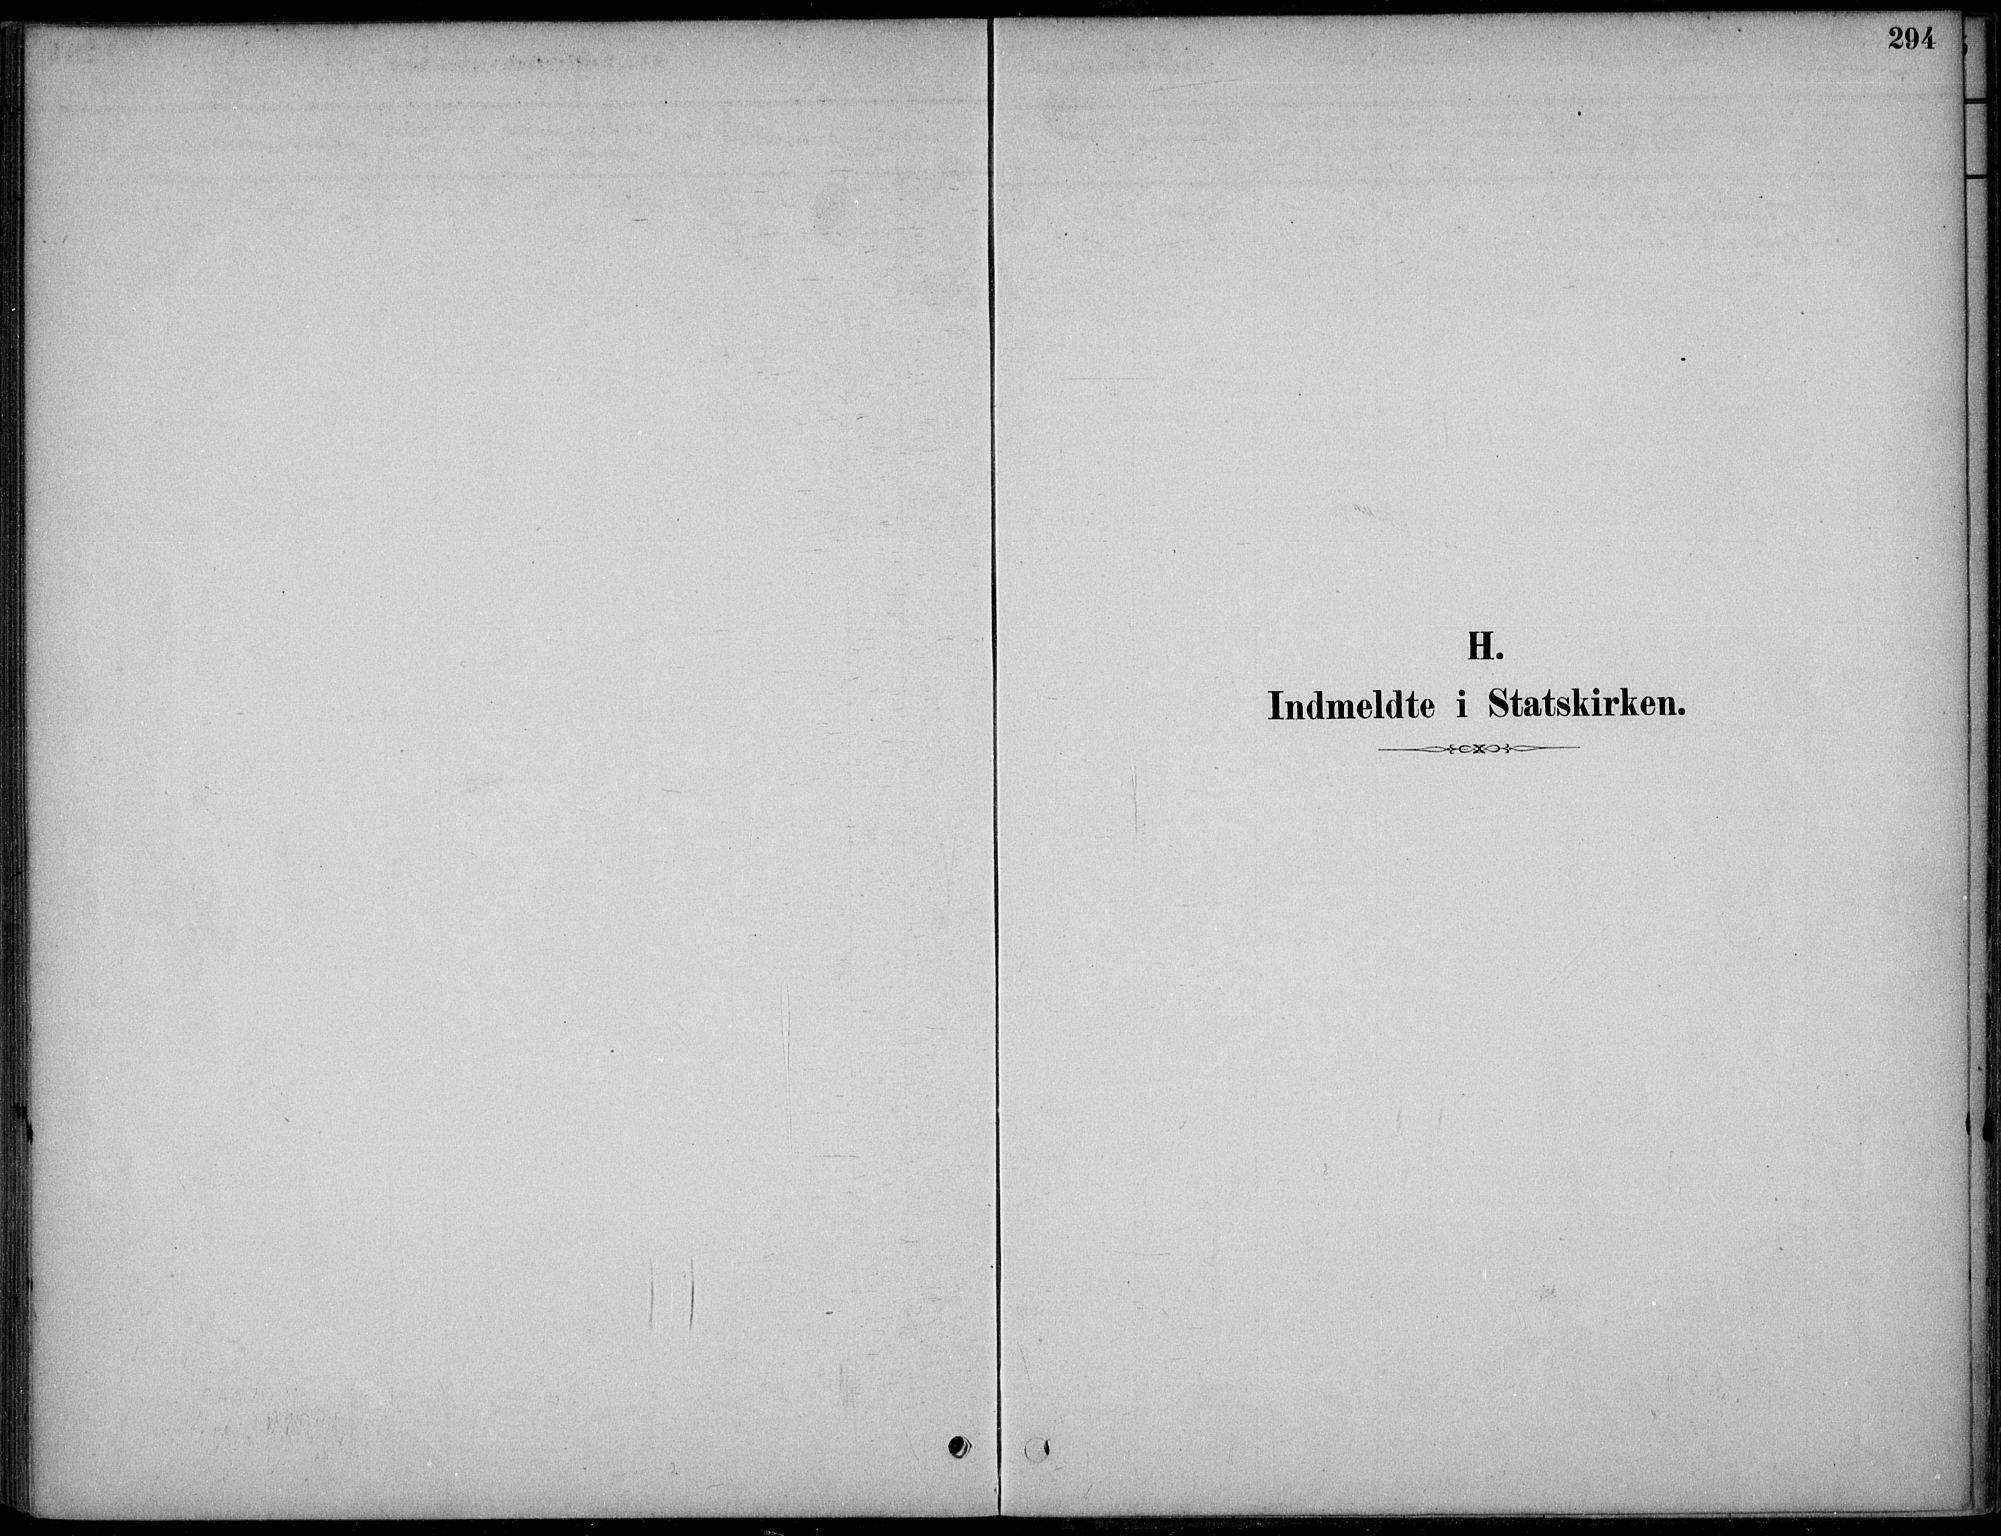 SAKO, Hjartdal kirkebøker, F/Fc/L0002: Ministerialbok nr. III 2, 1880-1936, s. 294